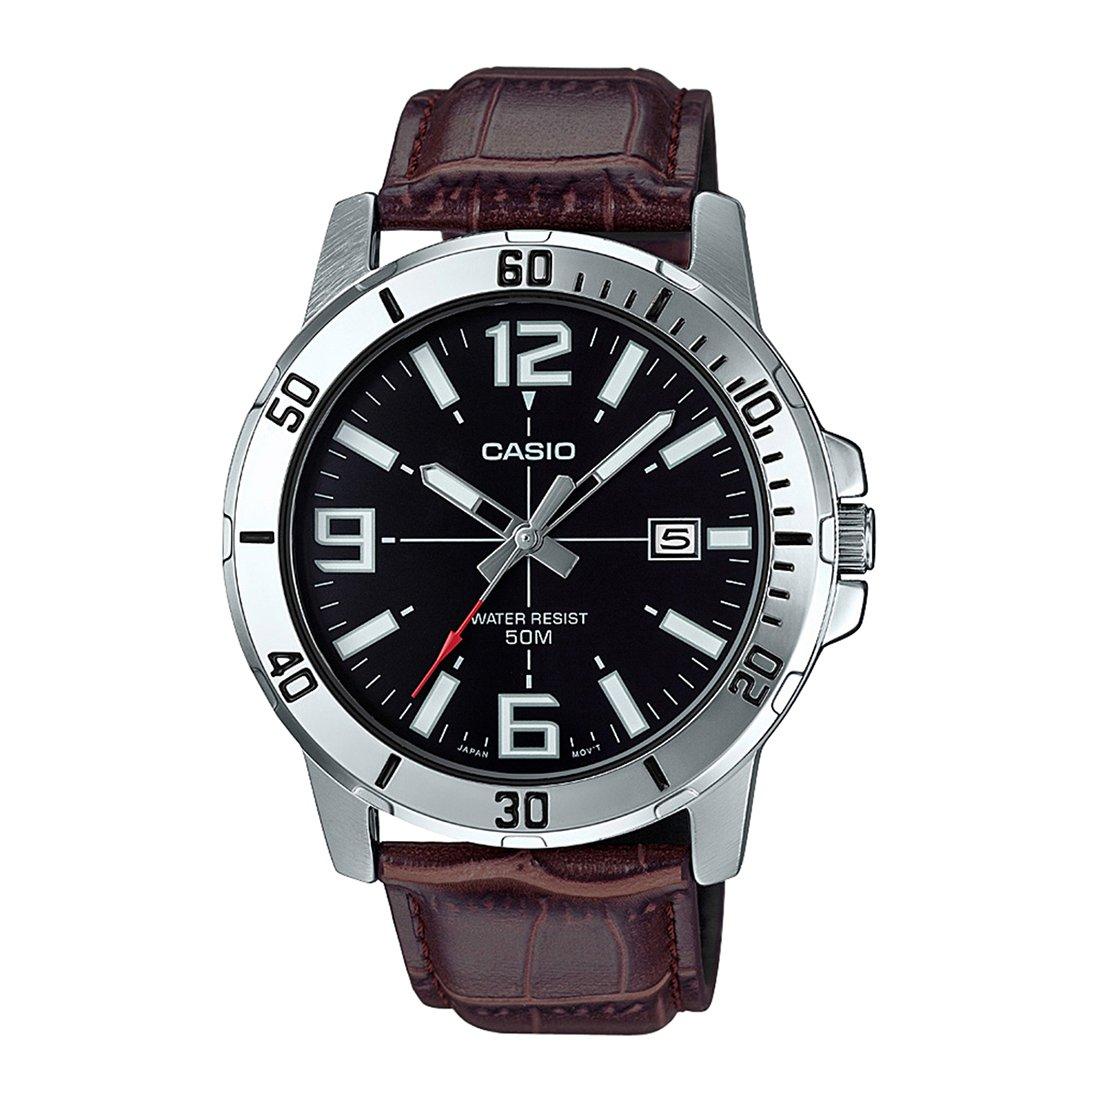 c0bb98514e50 Casio MTP-VD01L-1BV - Reloj Deportivo analógico Casual para Hombre ...